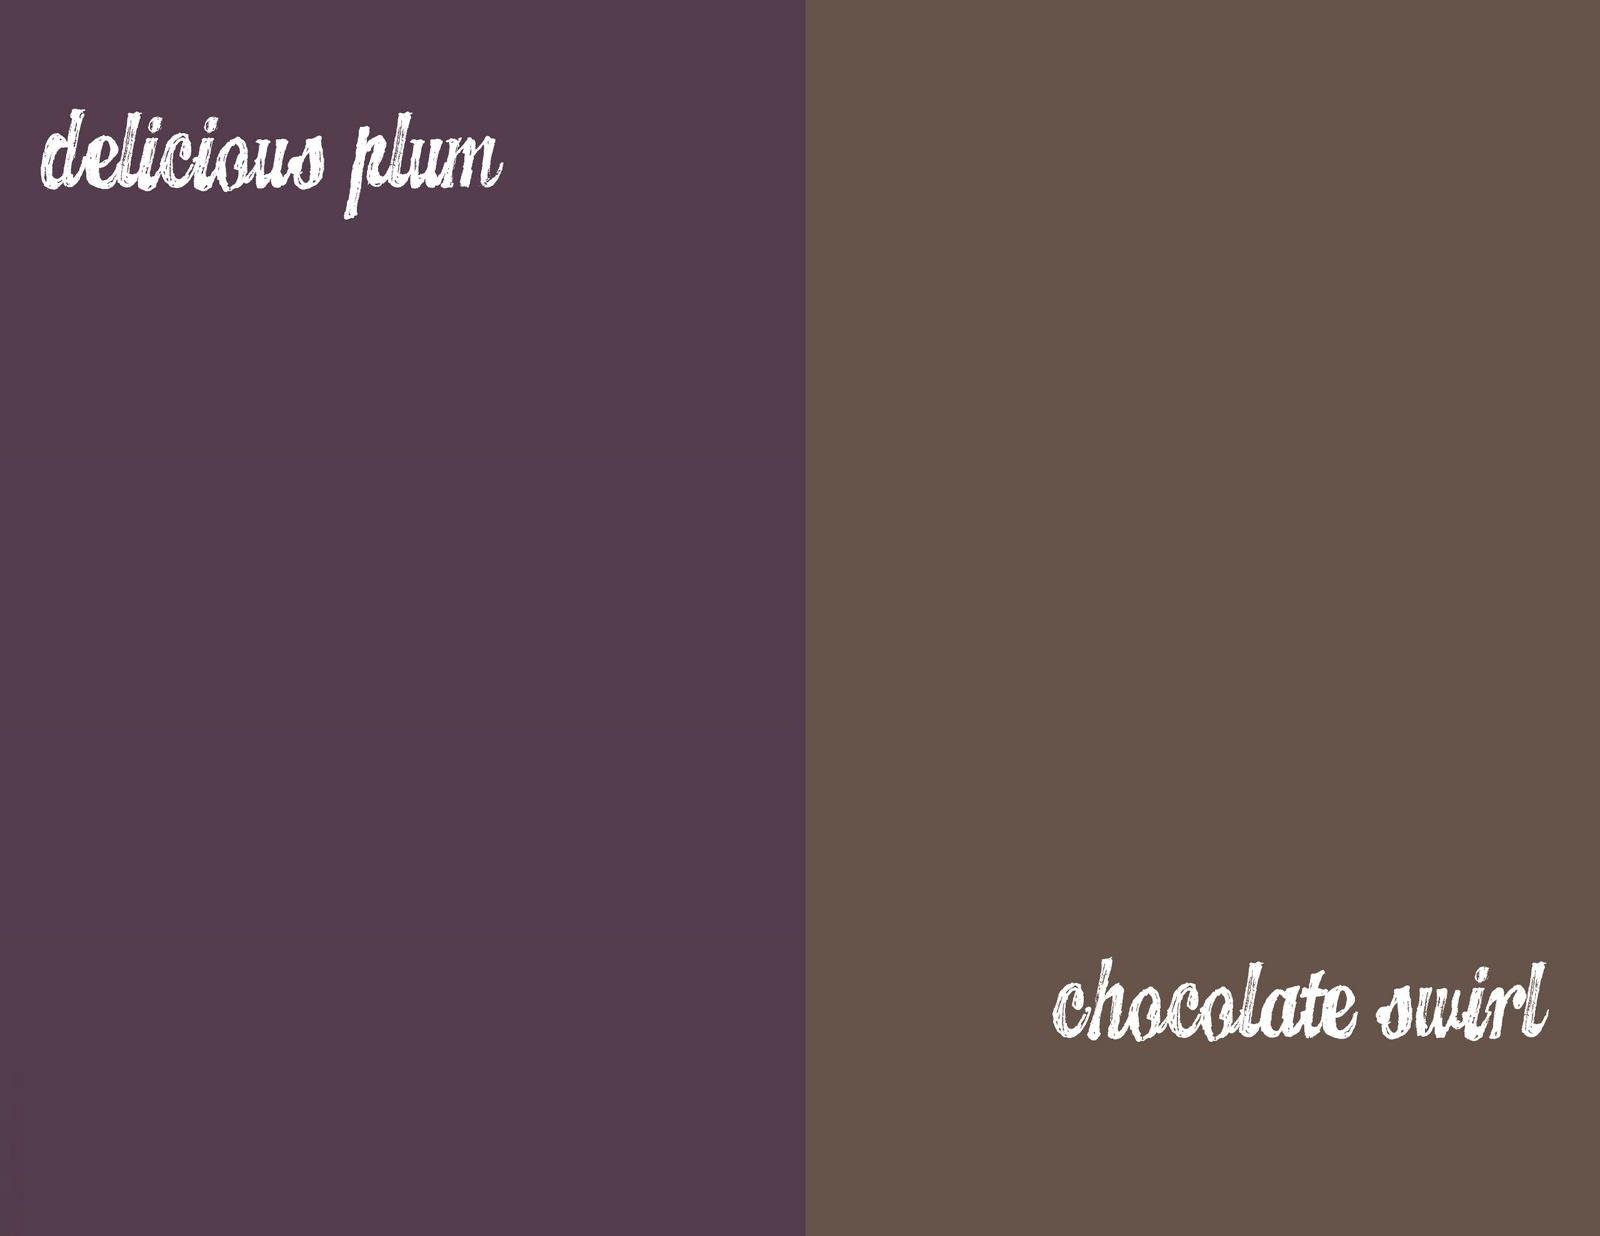 purple and brown color scheme zef jam